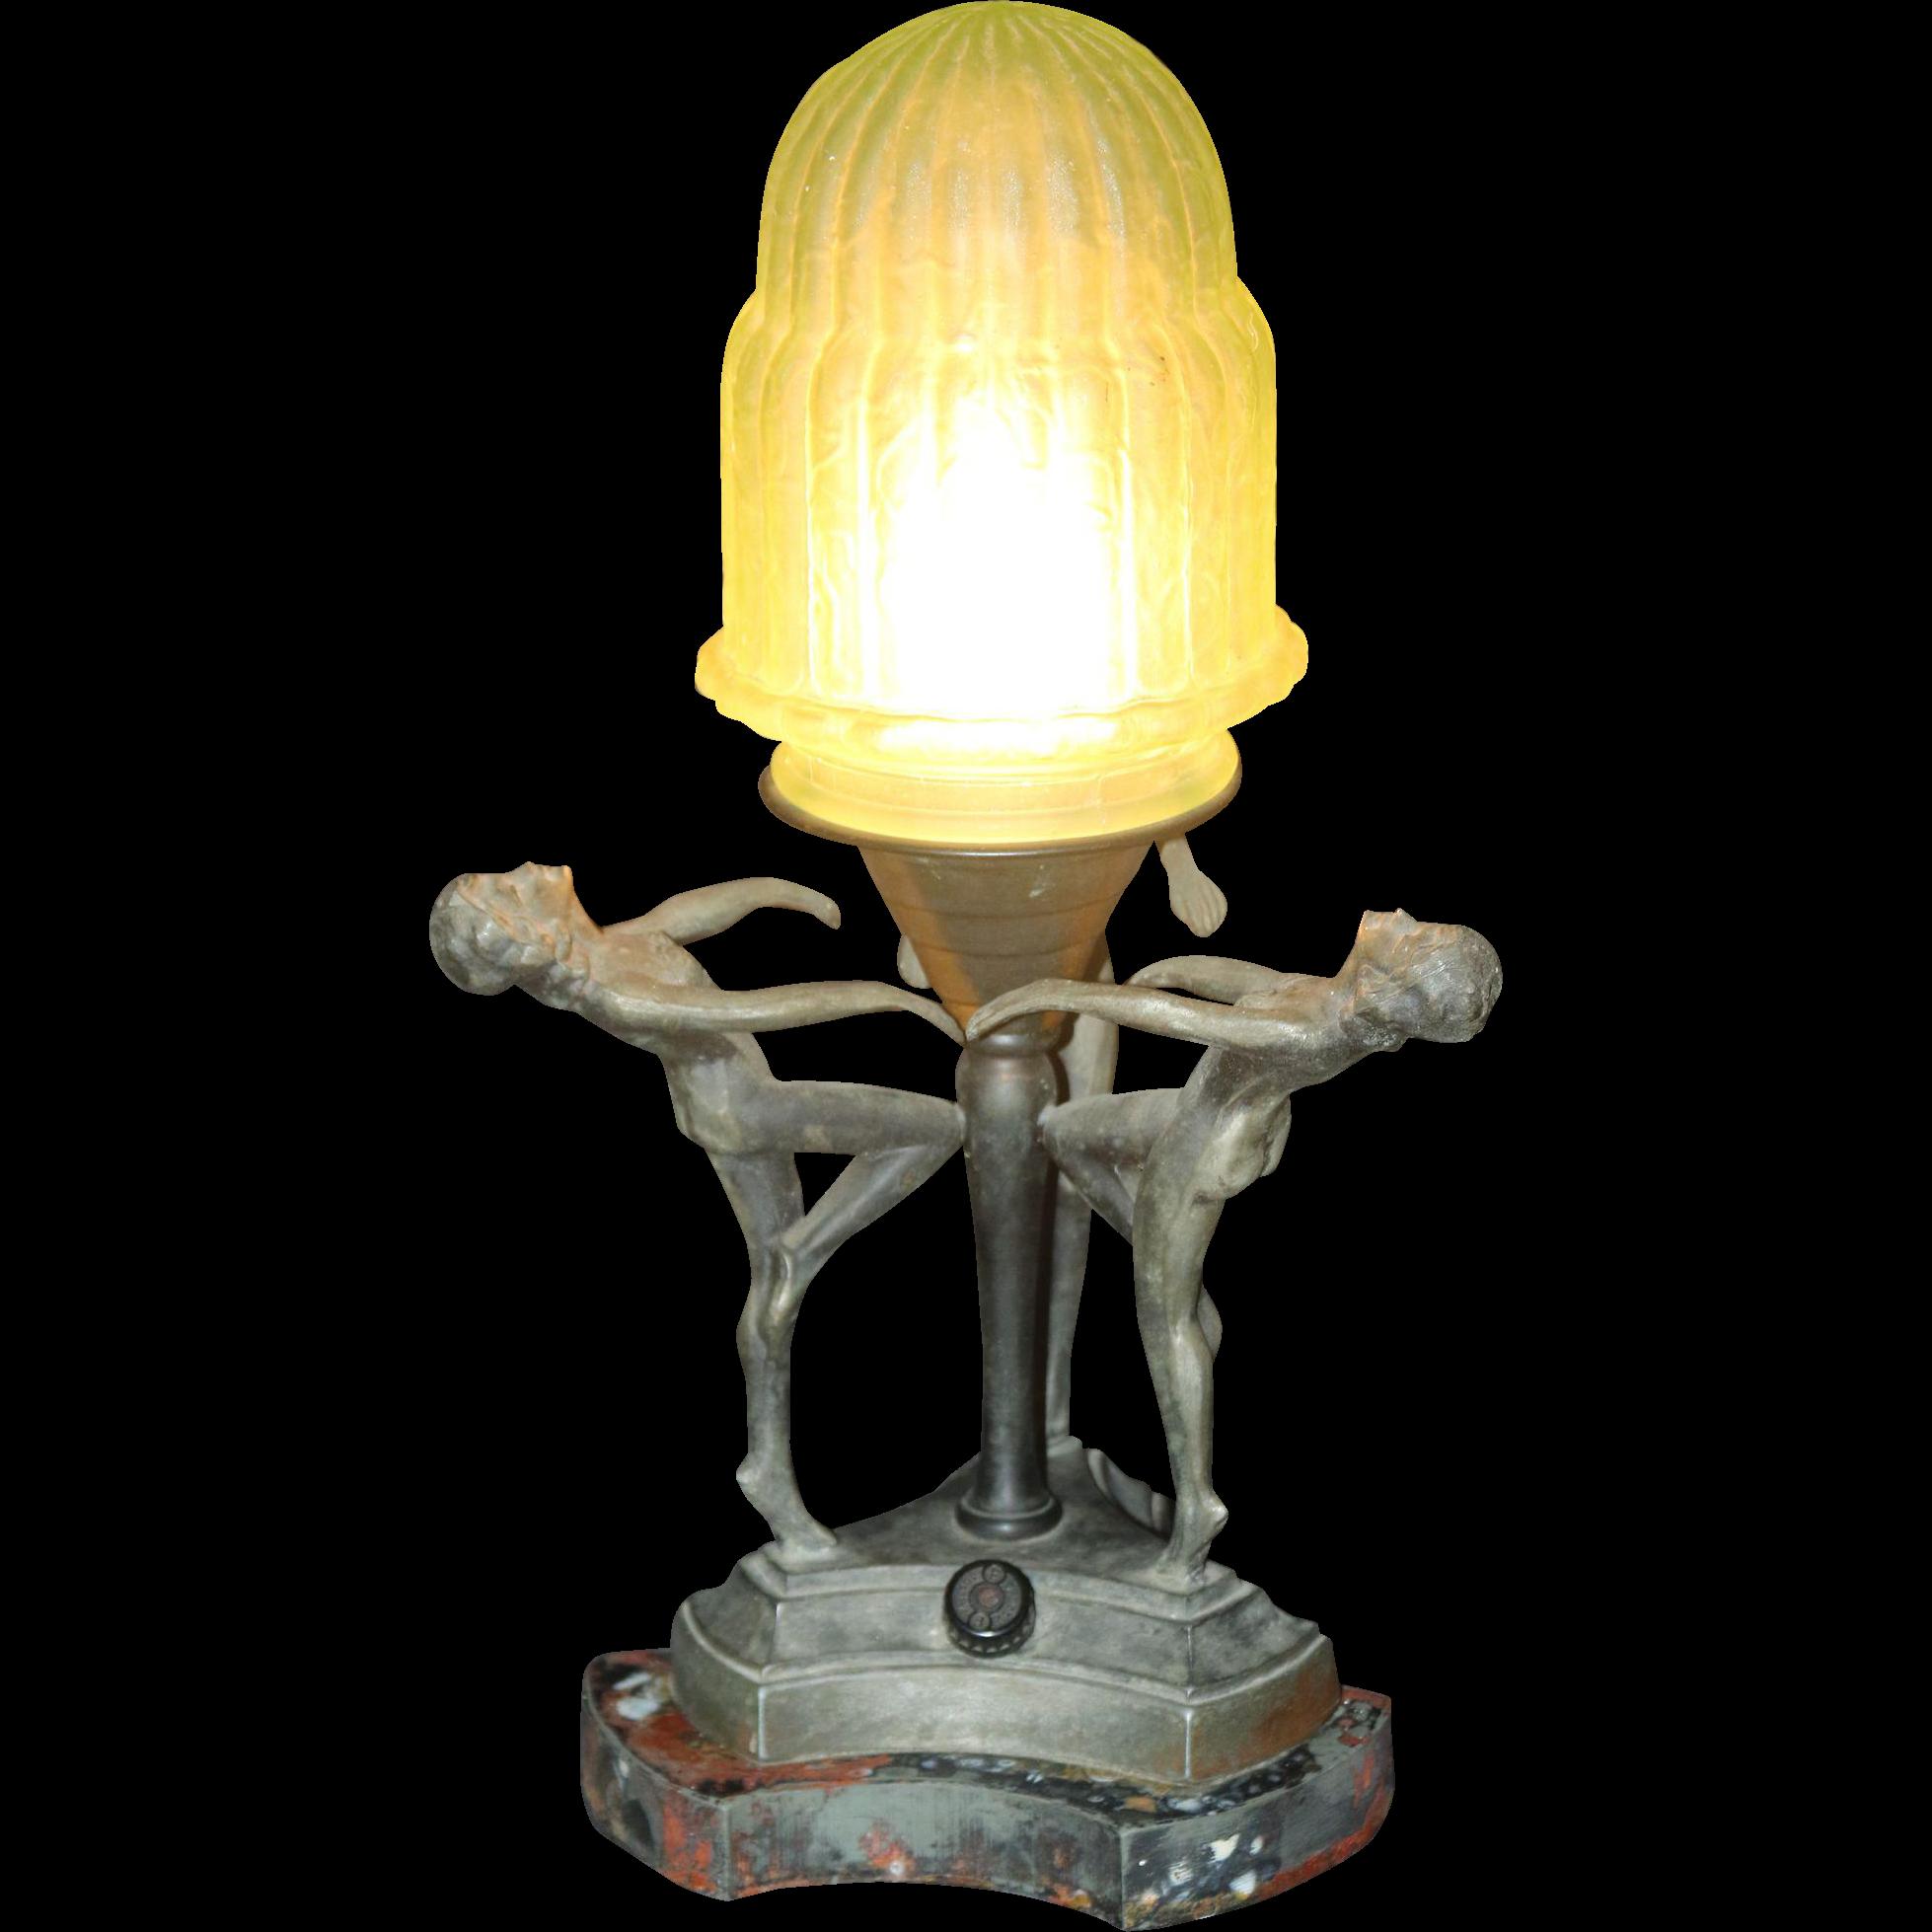 unusual 1930 s era art deco boudoir lamp with three. Black Bedroom Furniture Sets. Home Design Ideas